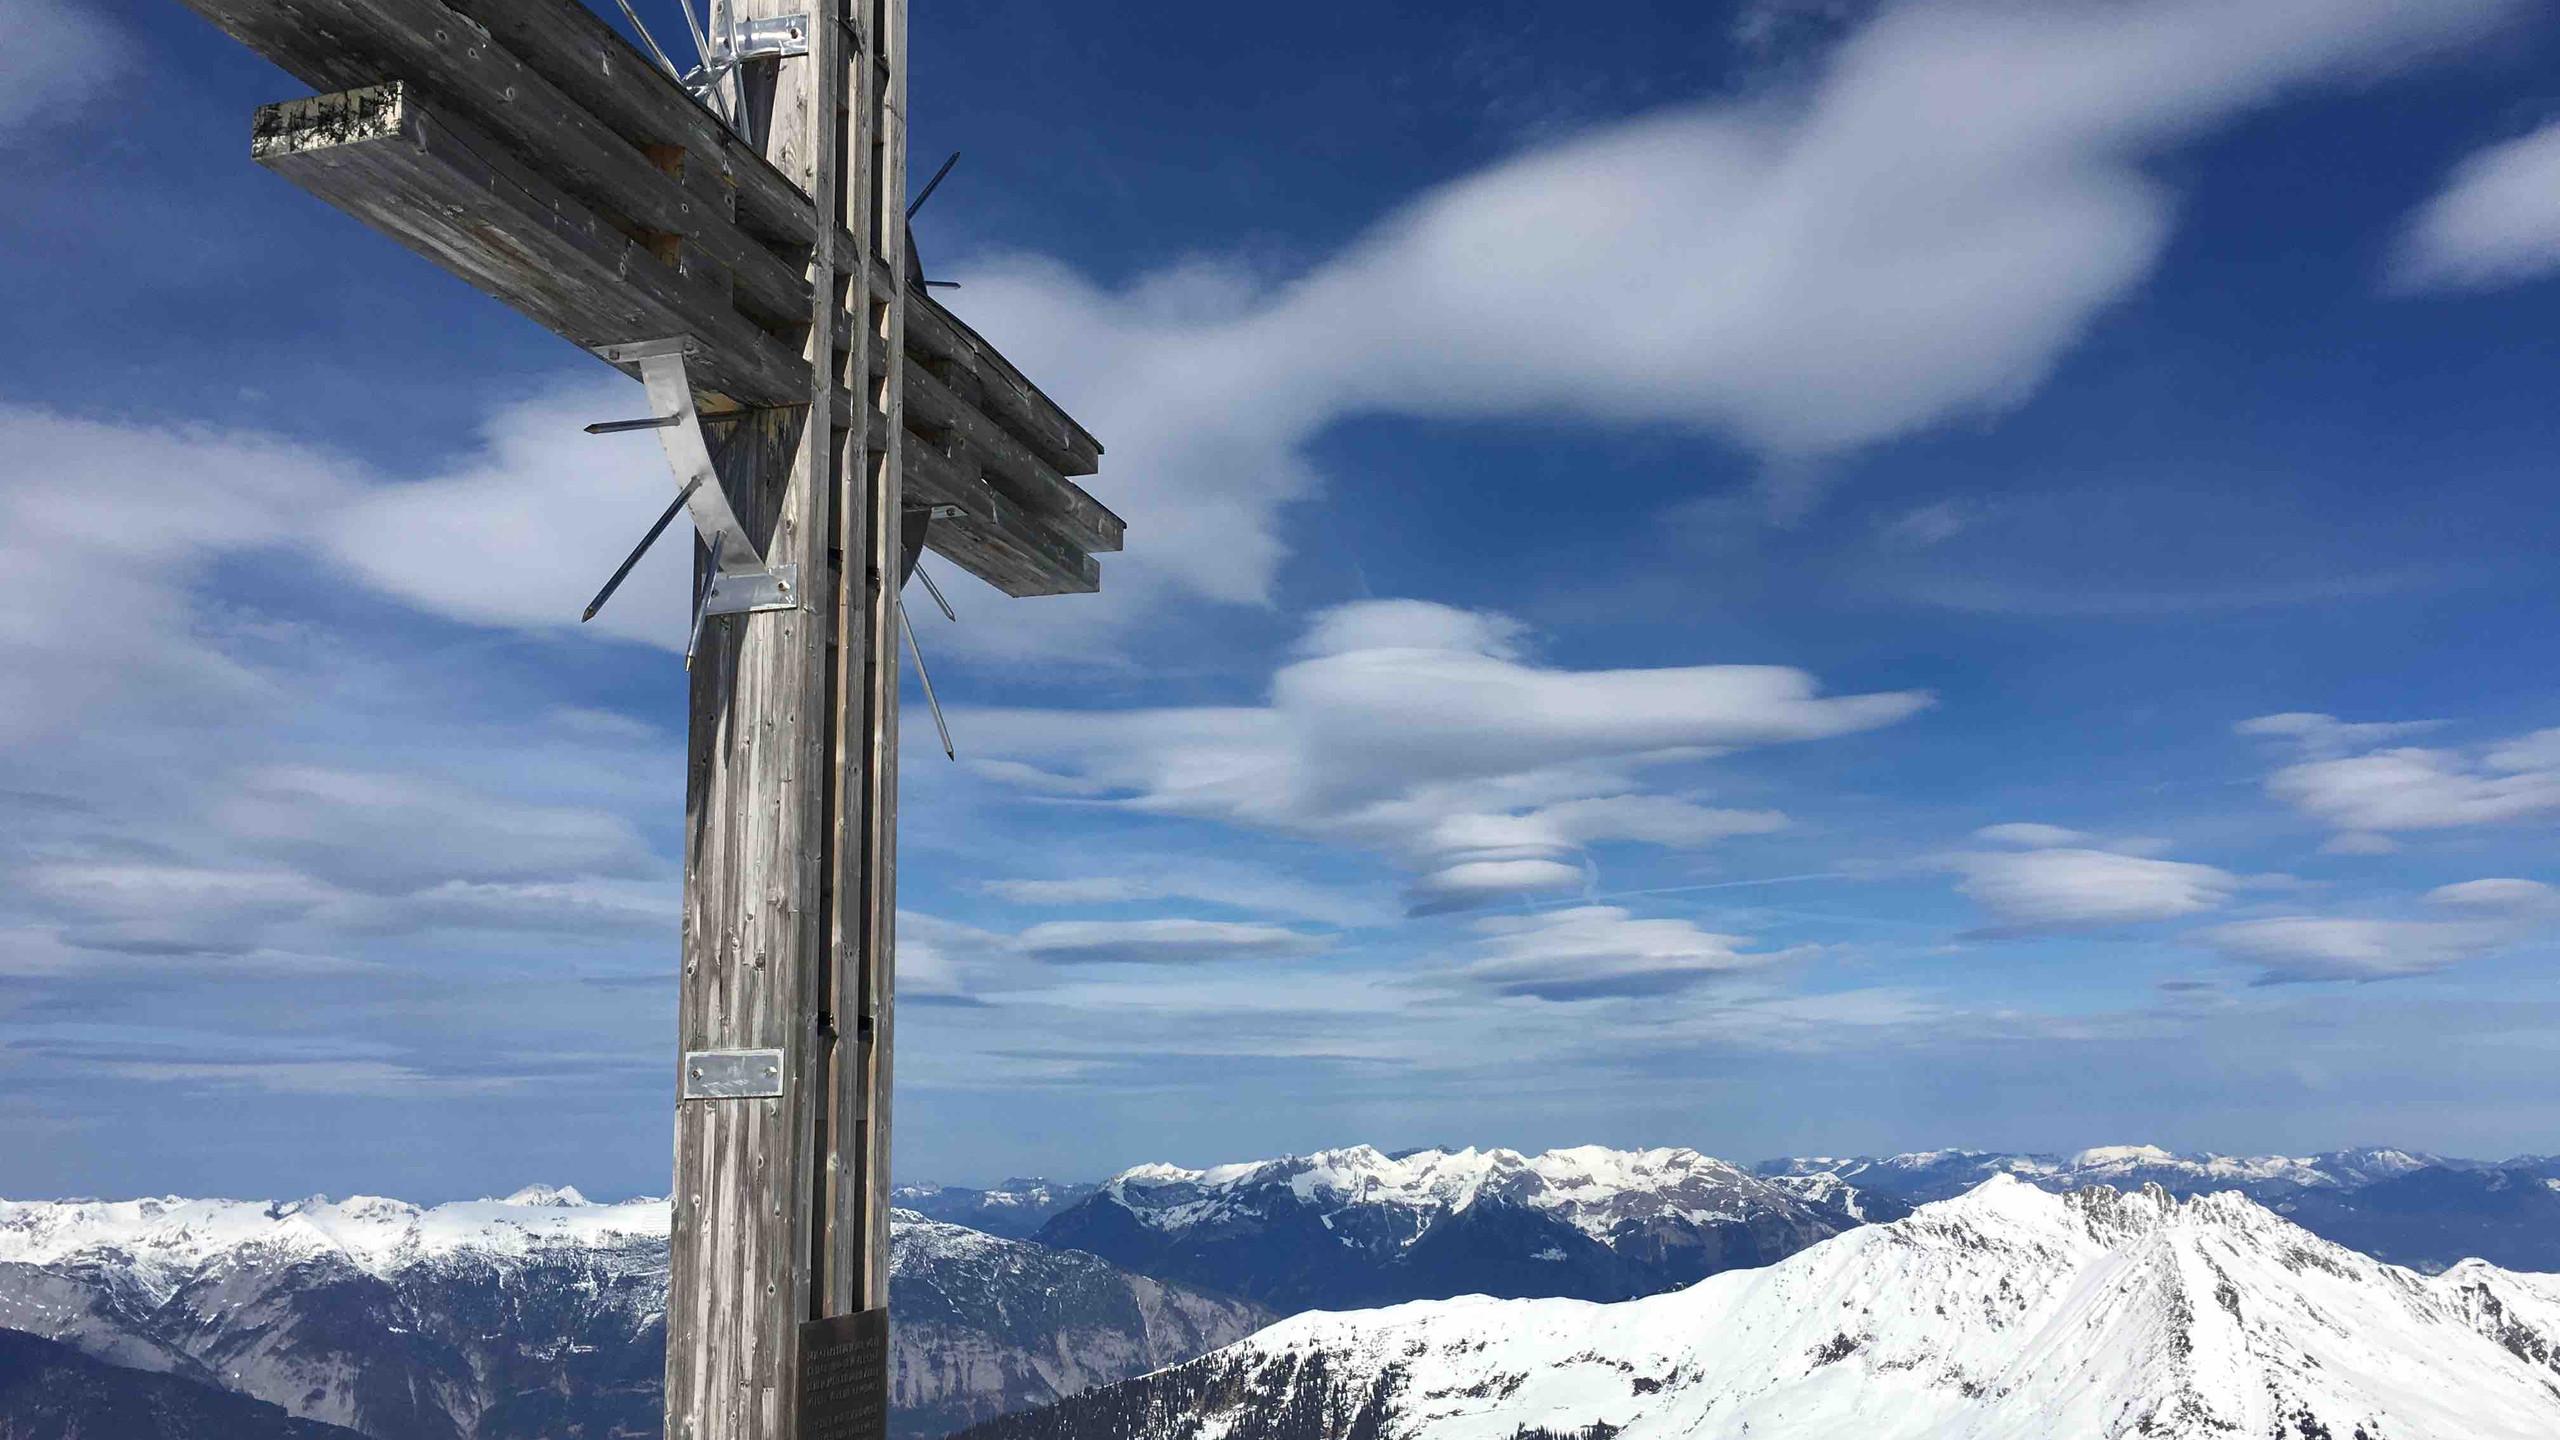 Gipfelkreuz, Skitour Gilfert